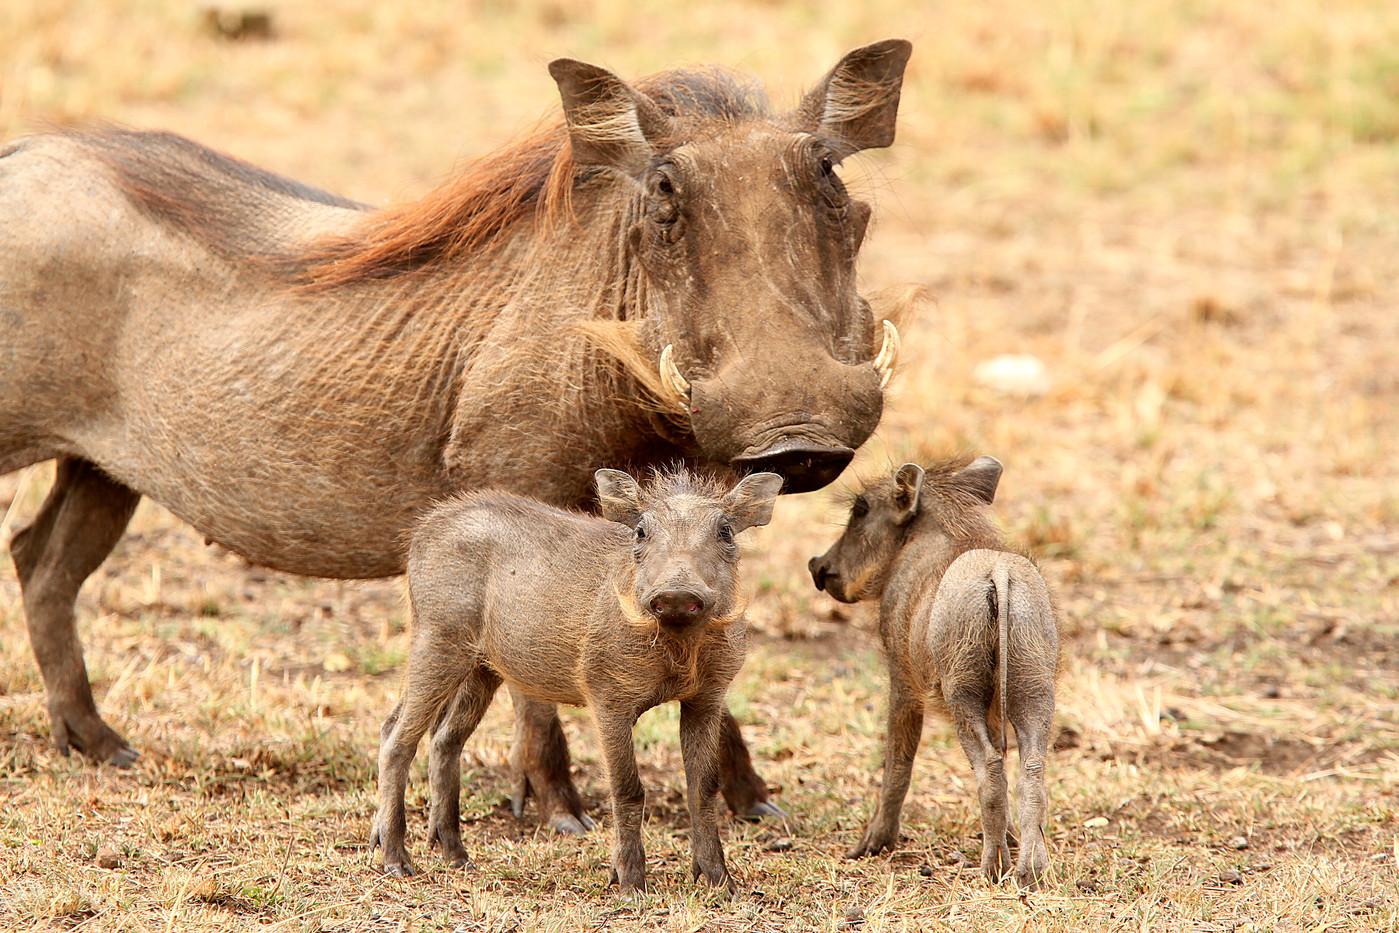 Warthog & piglets in the Serengeti NP, Tanzania